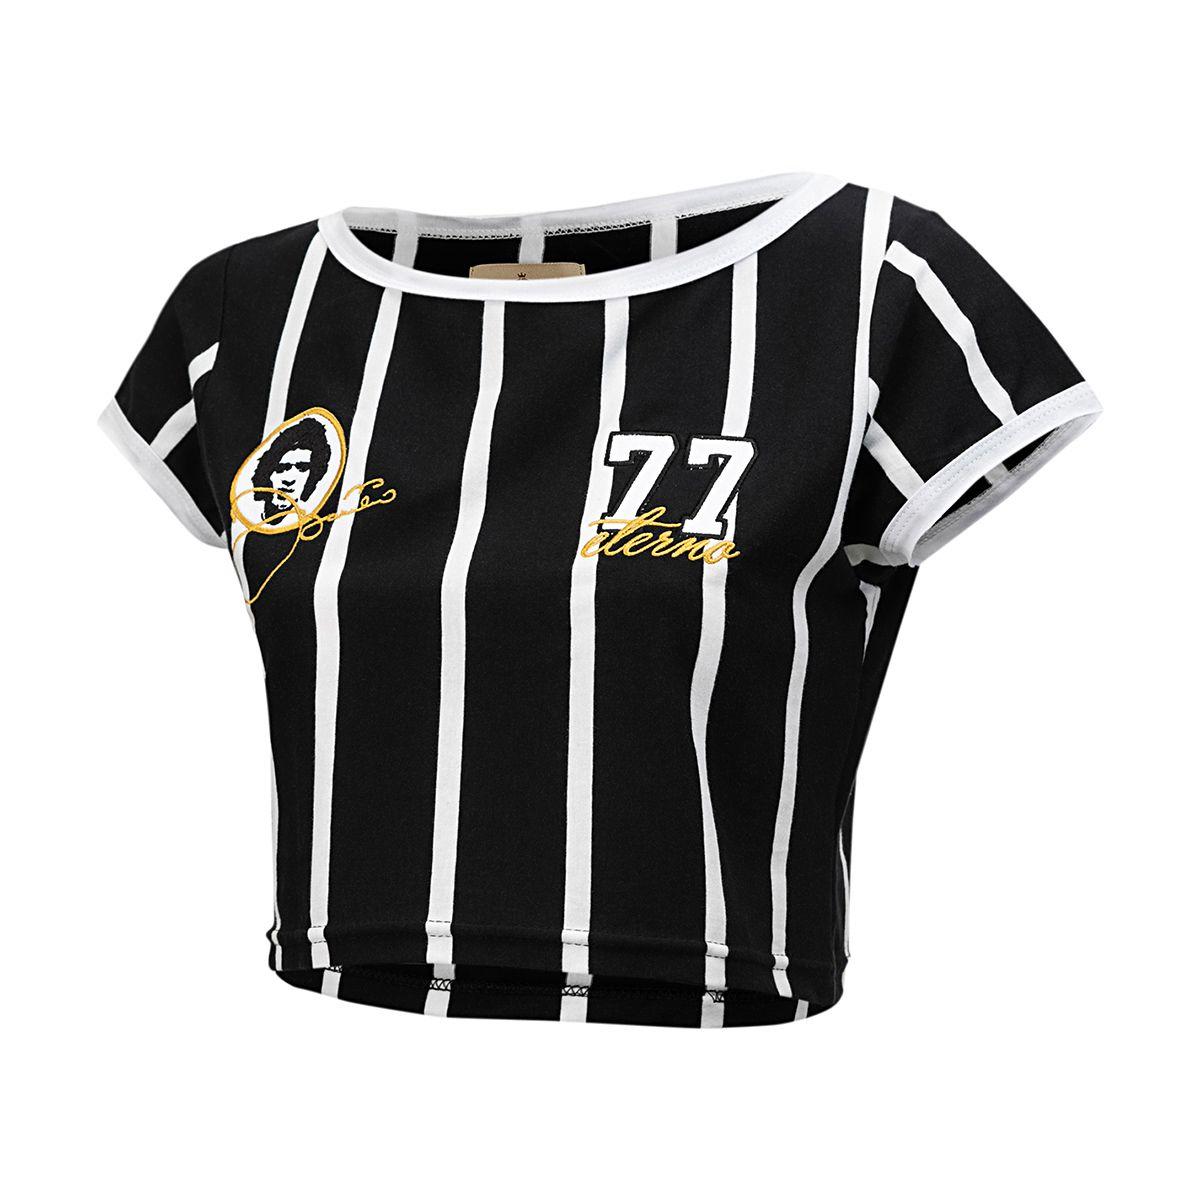 Camisa Retrô Gol Cropped Corinthians Basílio Feminina